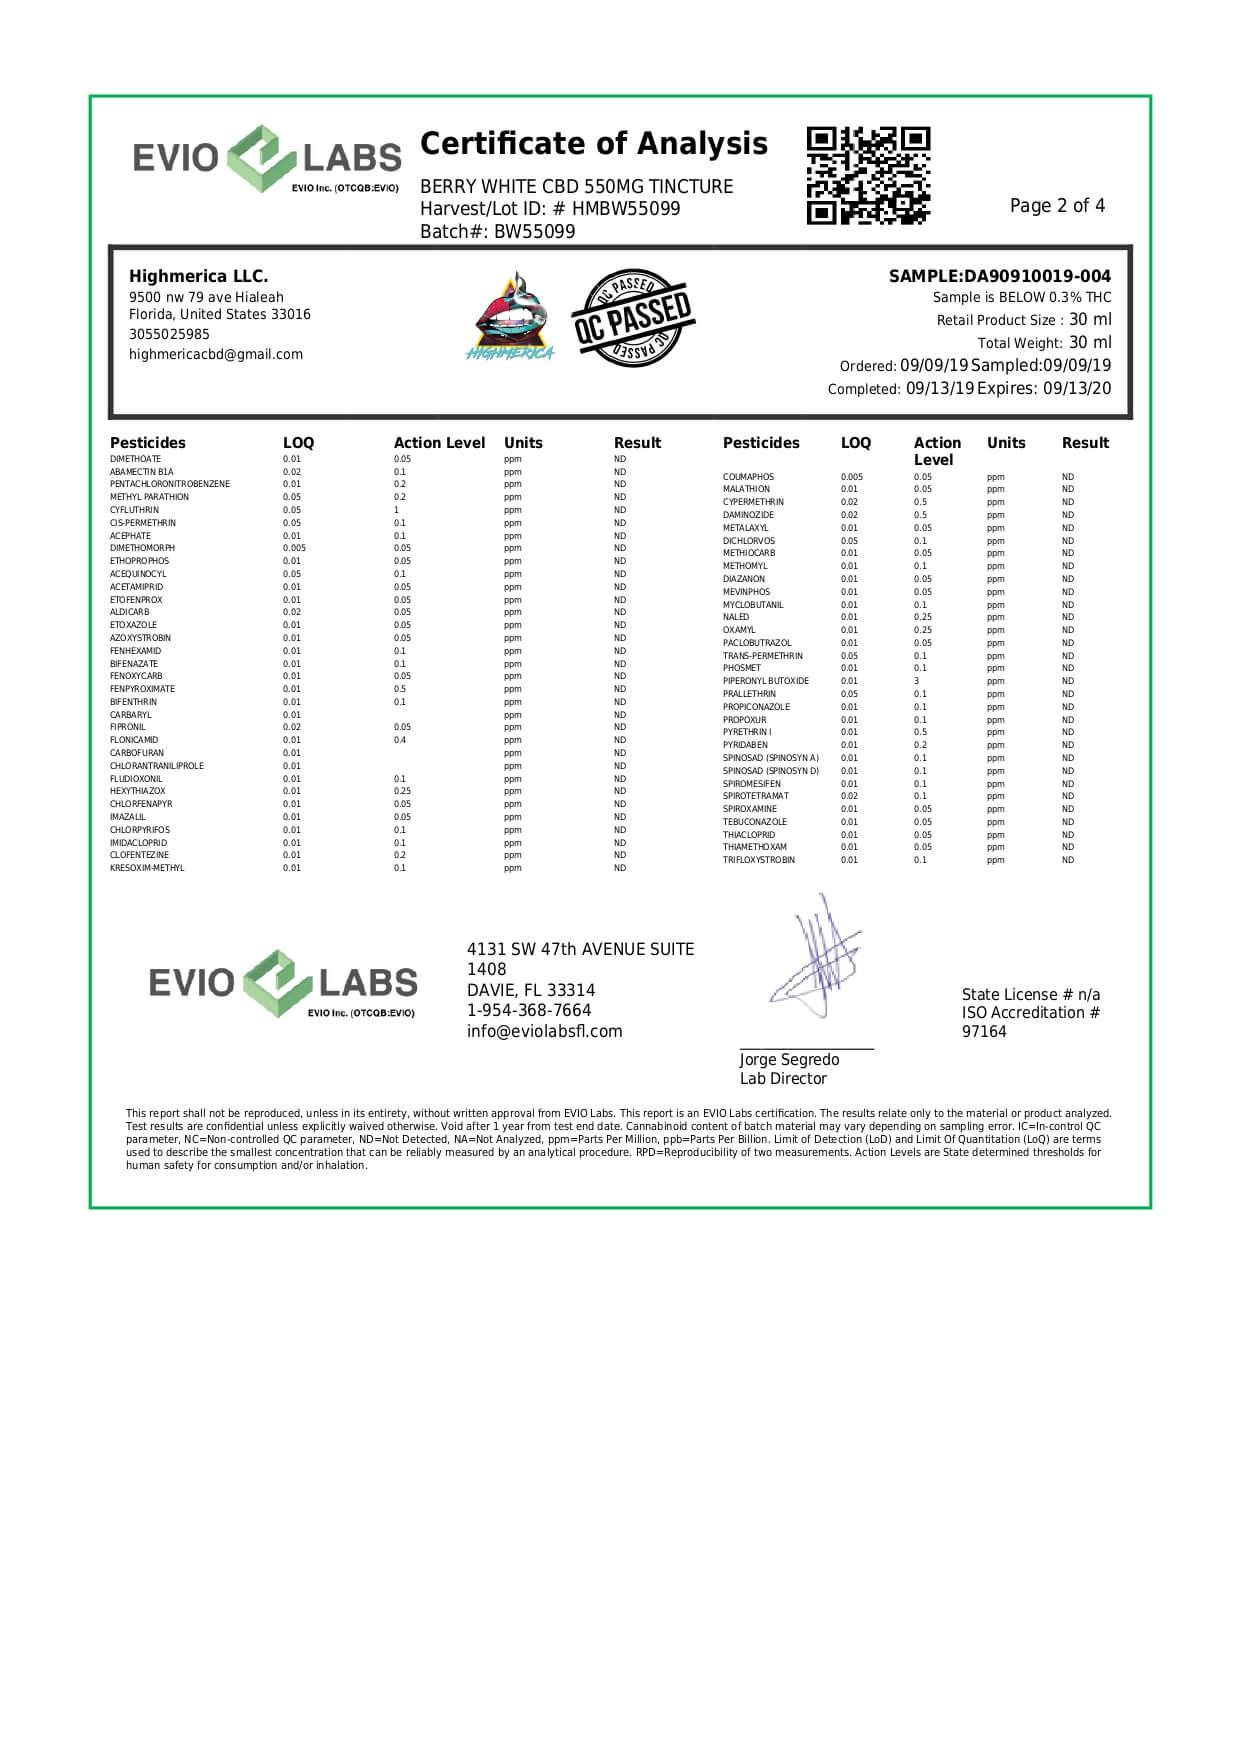 Highmerica CBD Terpenes Oil Berry White Lab Report